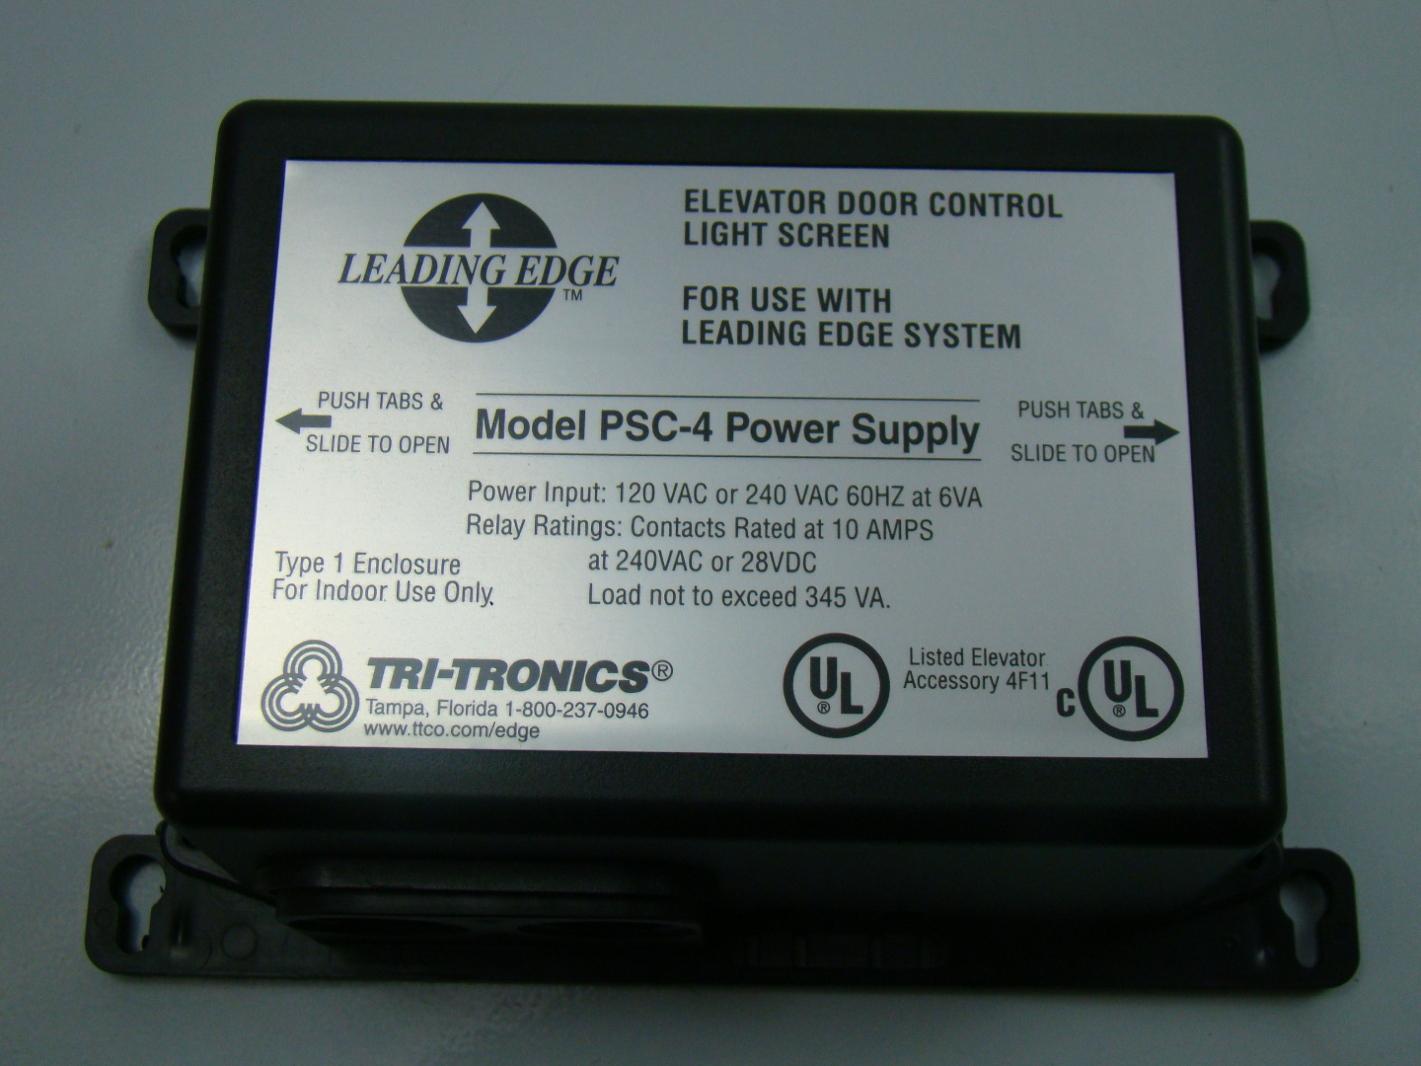 Tri-Tronics Leading Edge Elevator Door Control LIght Screen 120VAC PSC-4 ... & Tri-Tronics Leading Edge Elevator Door Control LIght Screen 120VAC ... pezcame.com